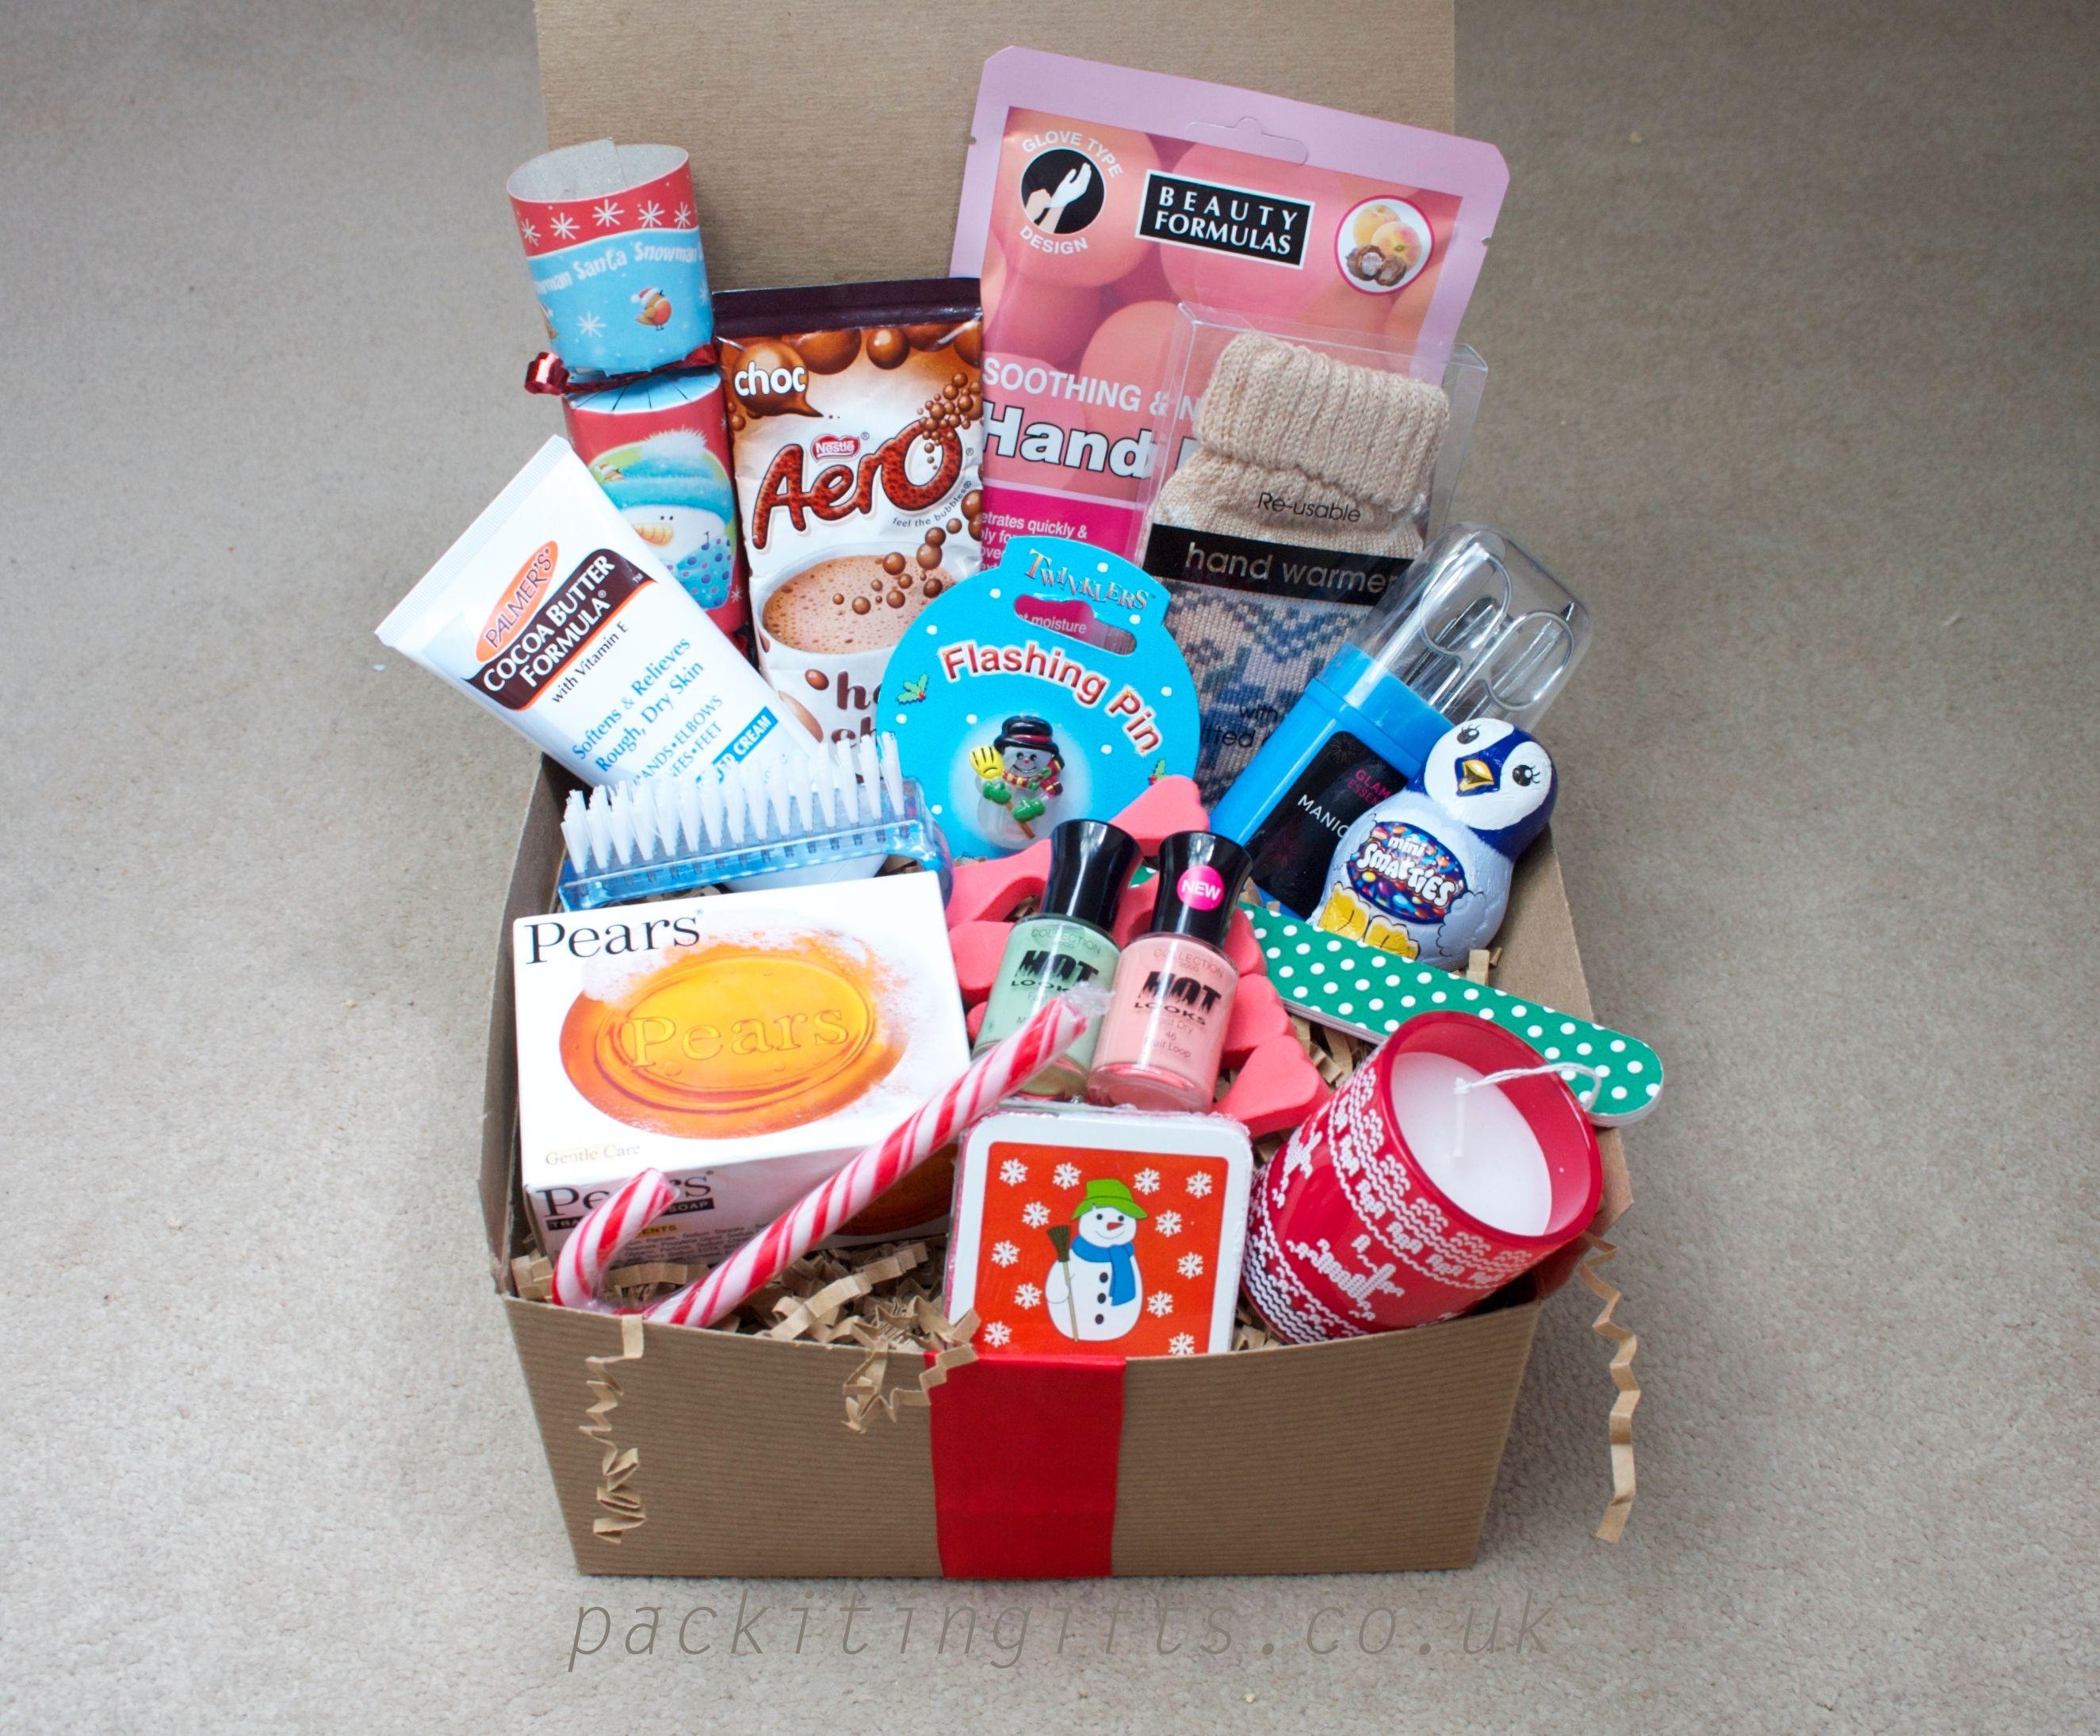 its a box of stuff for women ect  c9109d0d8